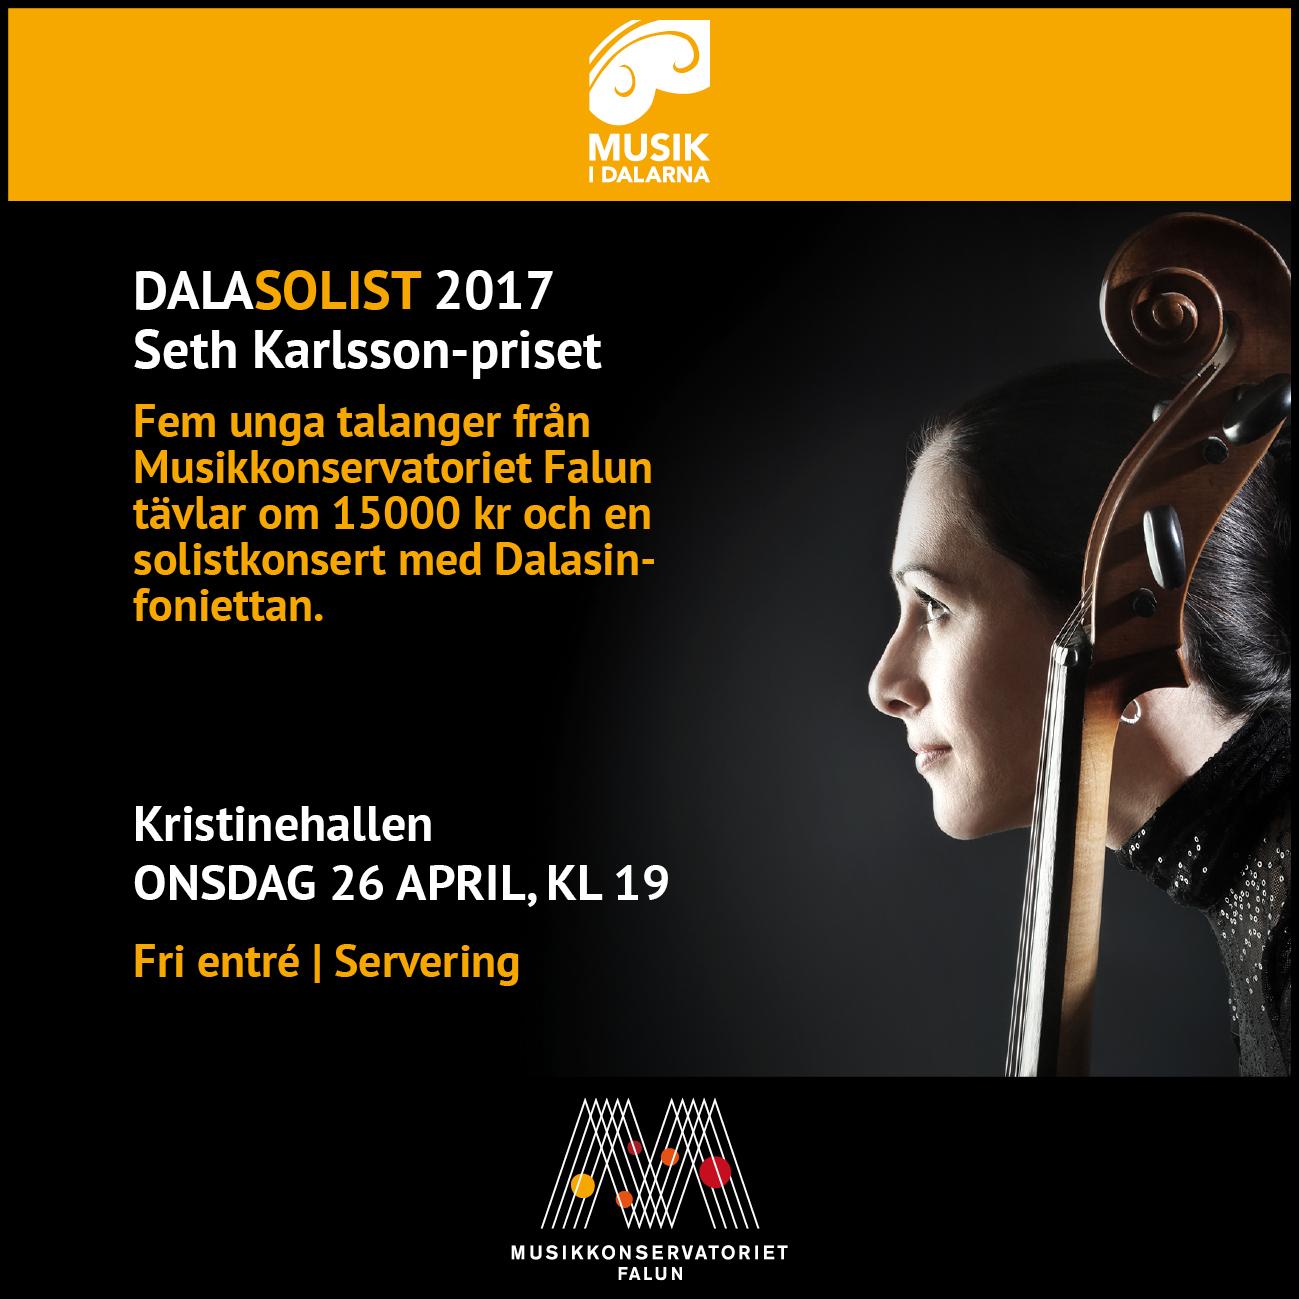 Dalasolist 2017 annons kvadrat